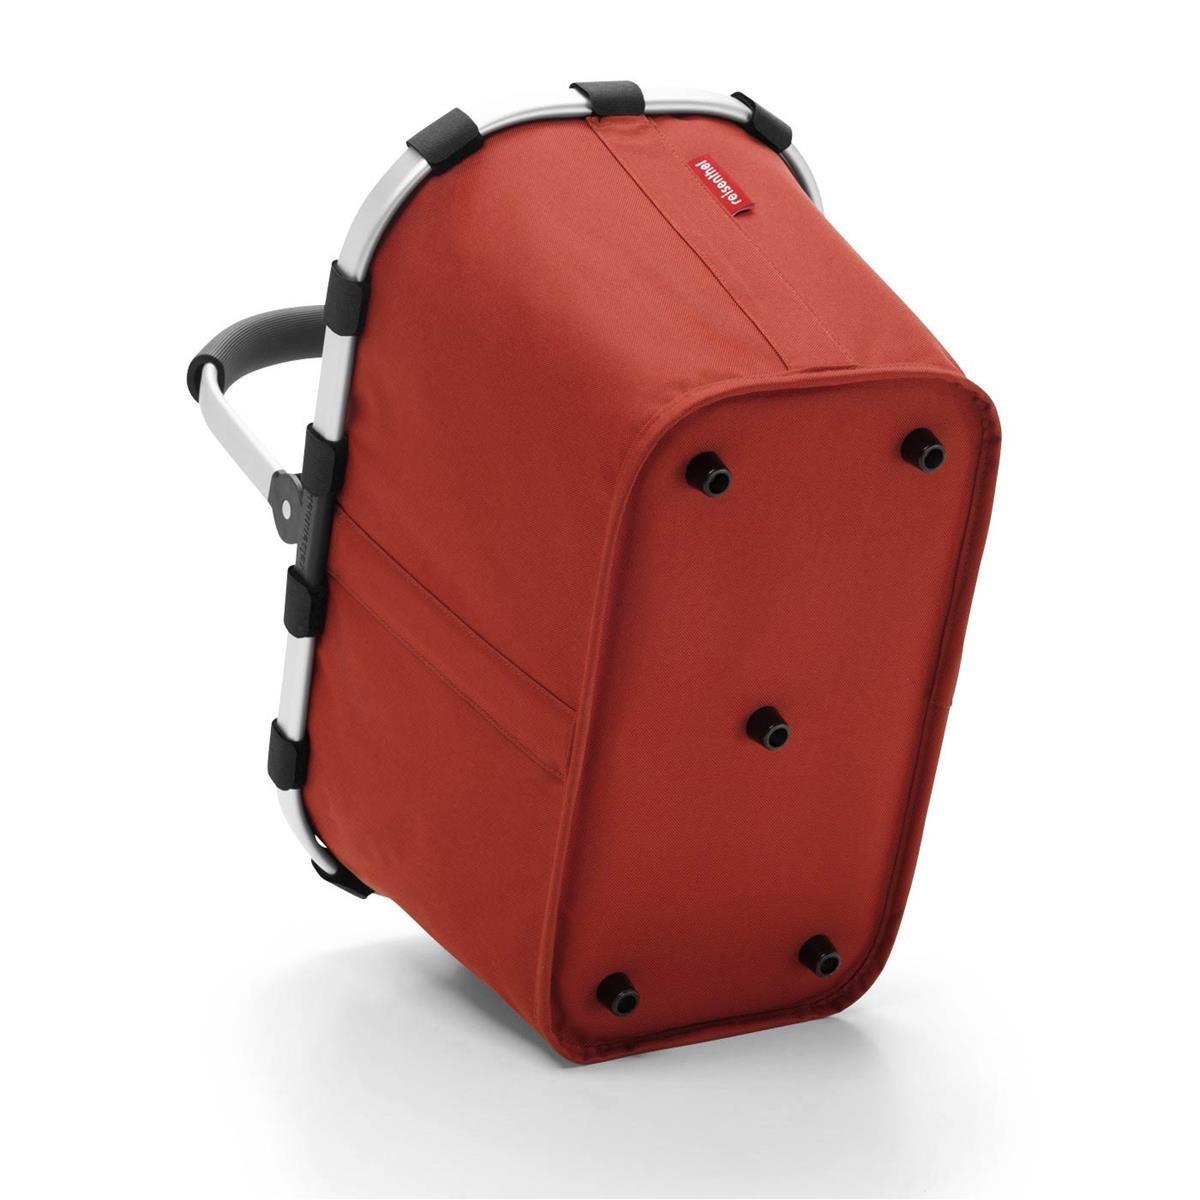 reisenthel carrybag black Einklaufskorb 48 x 29 x 28 cm 22 Liter